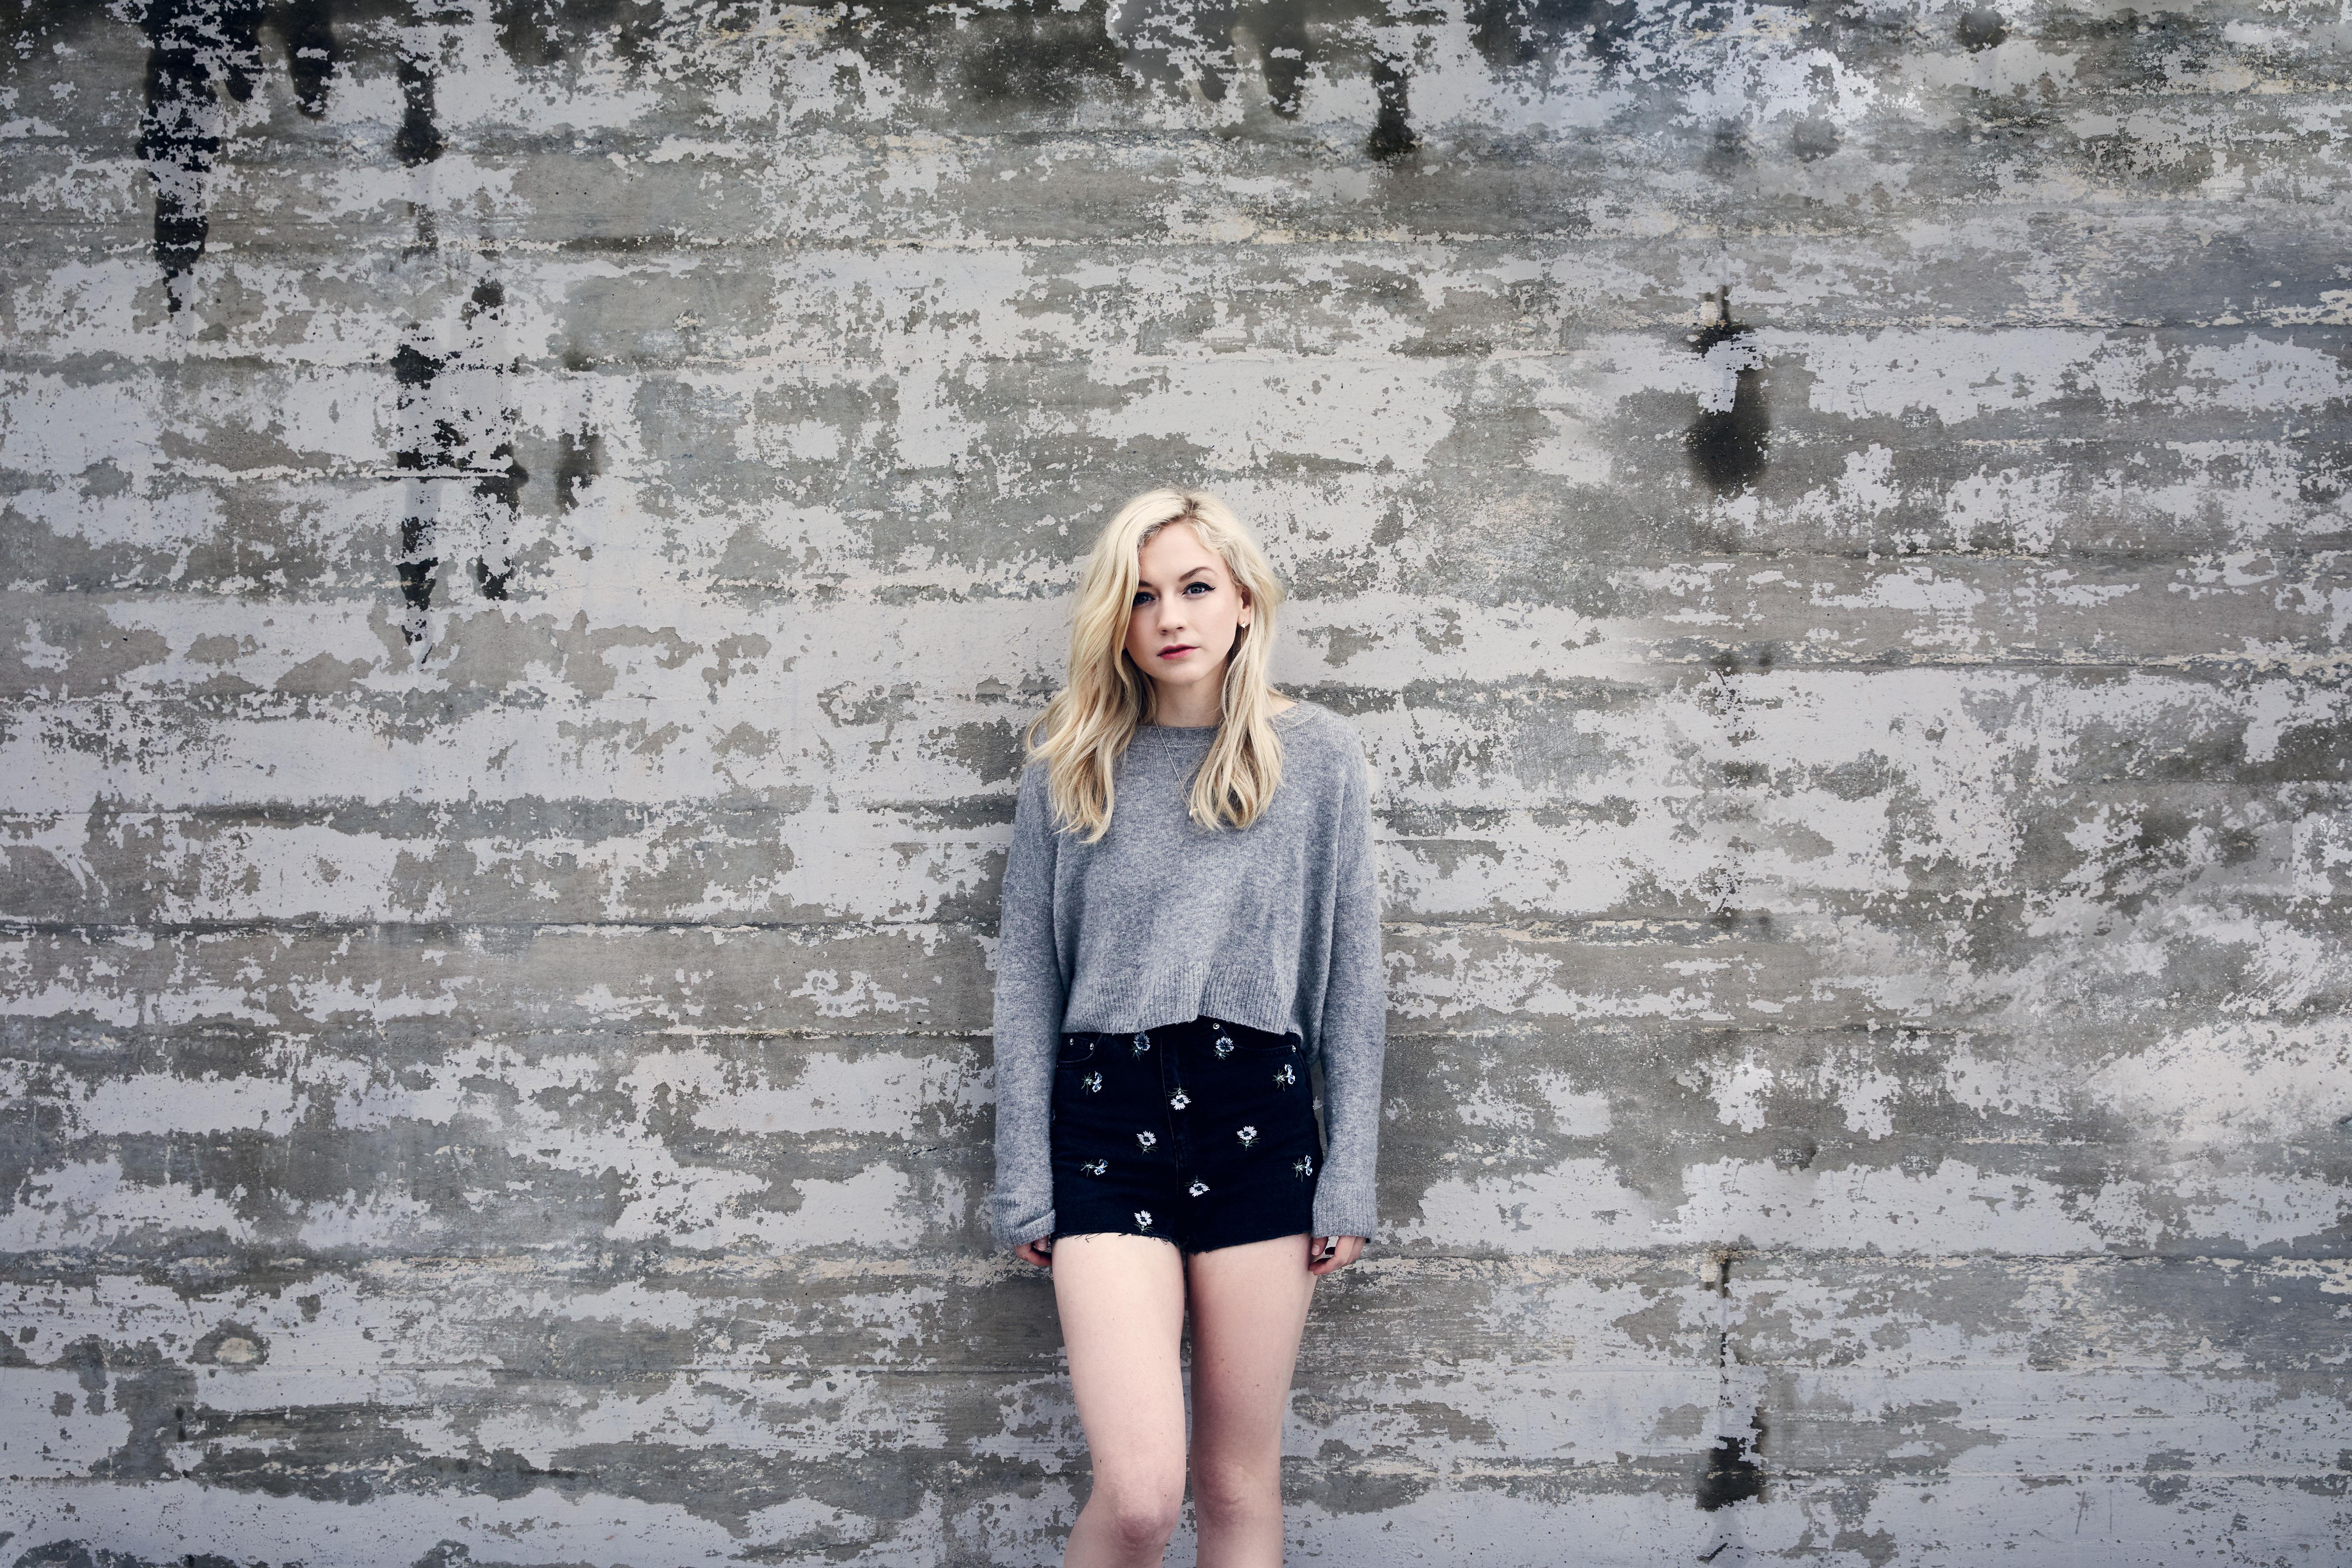 Emily Kinney 5k Retina Ultra Fondo De Pantalla Hd Fondo De